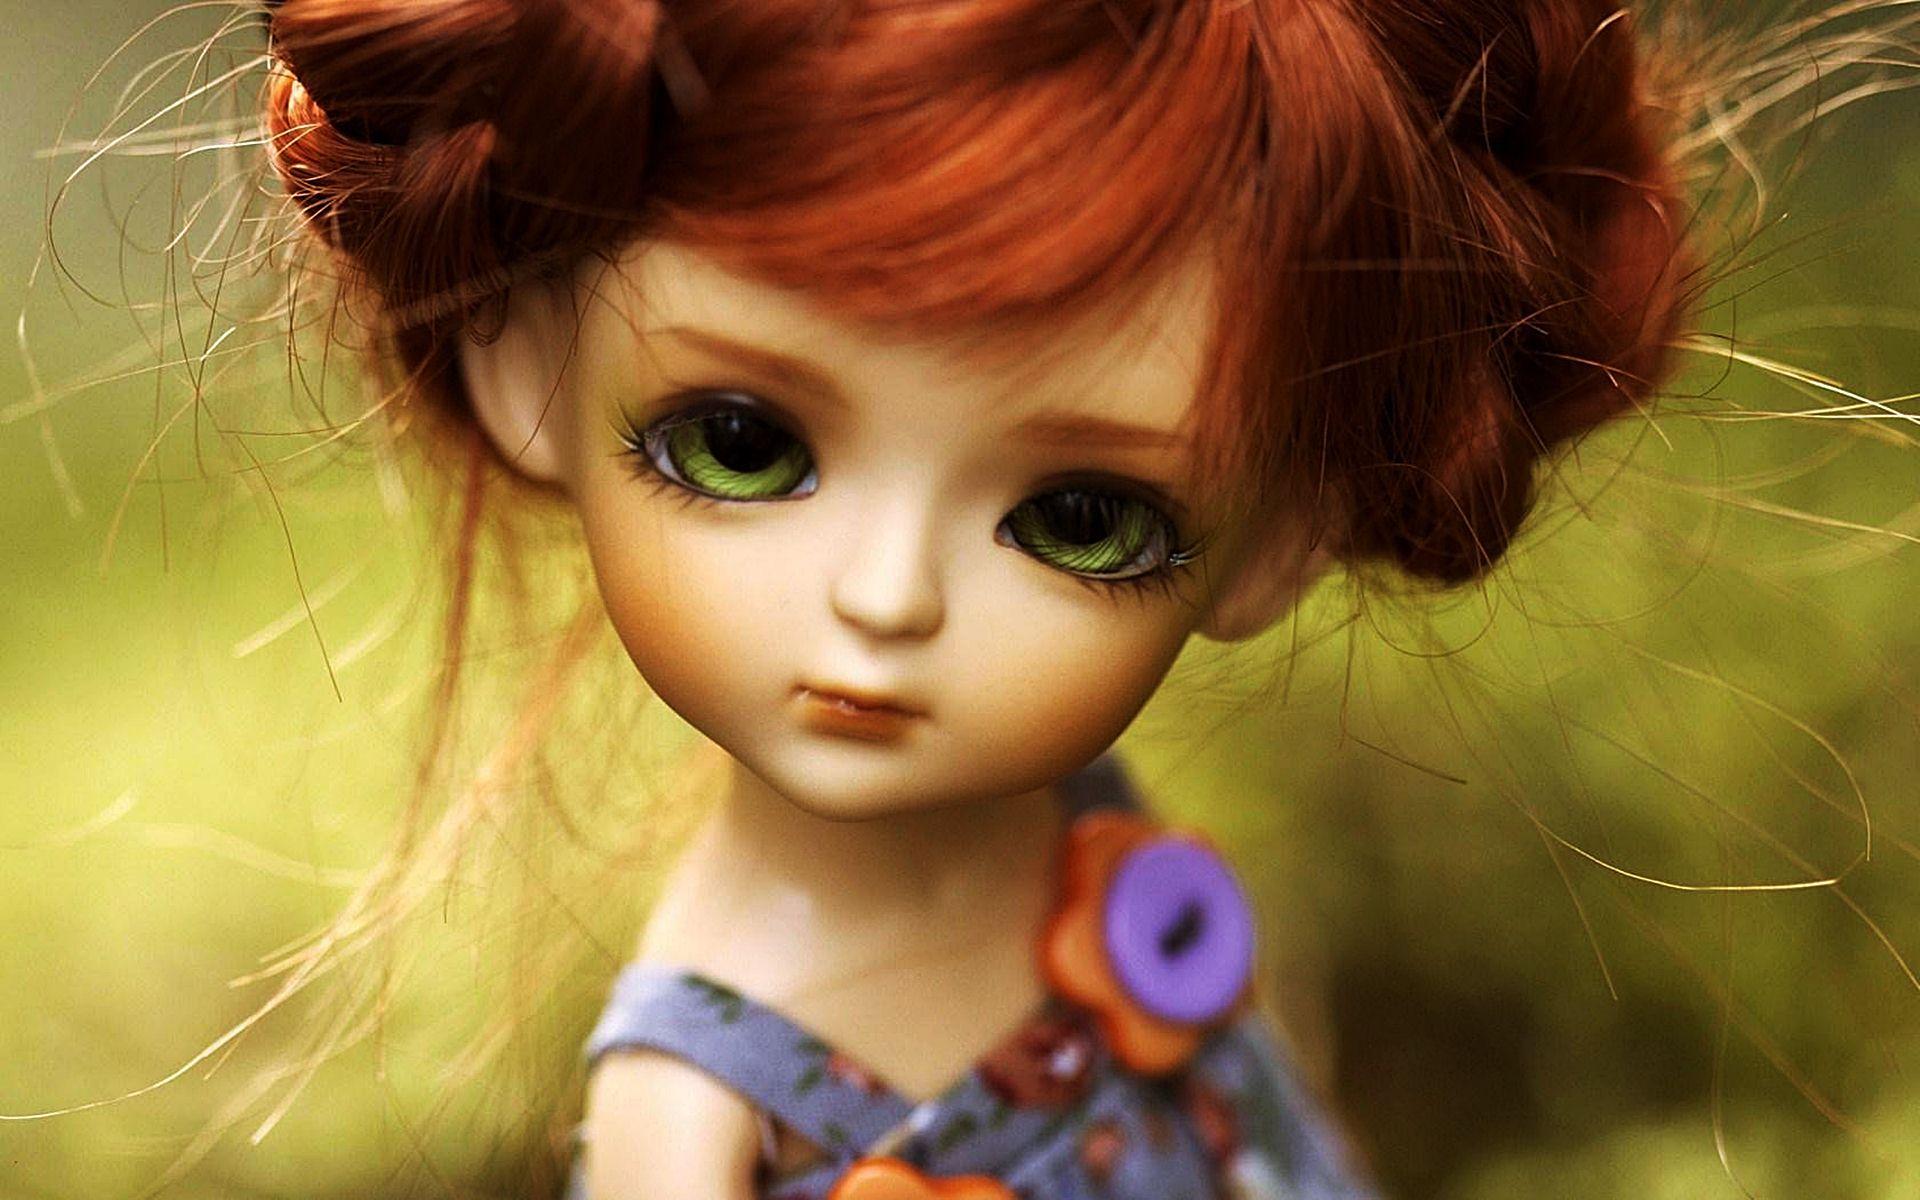 Cute Doll Wallpaper Amazing Images U0h0t5u4 Yoanu 1920x1200